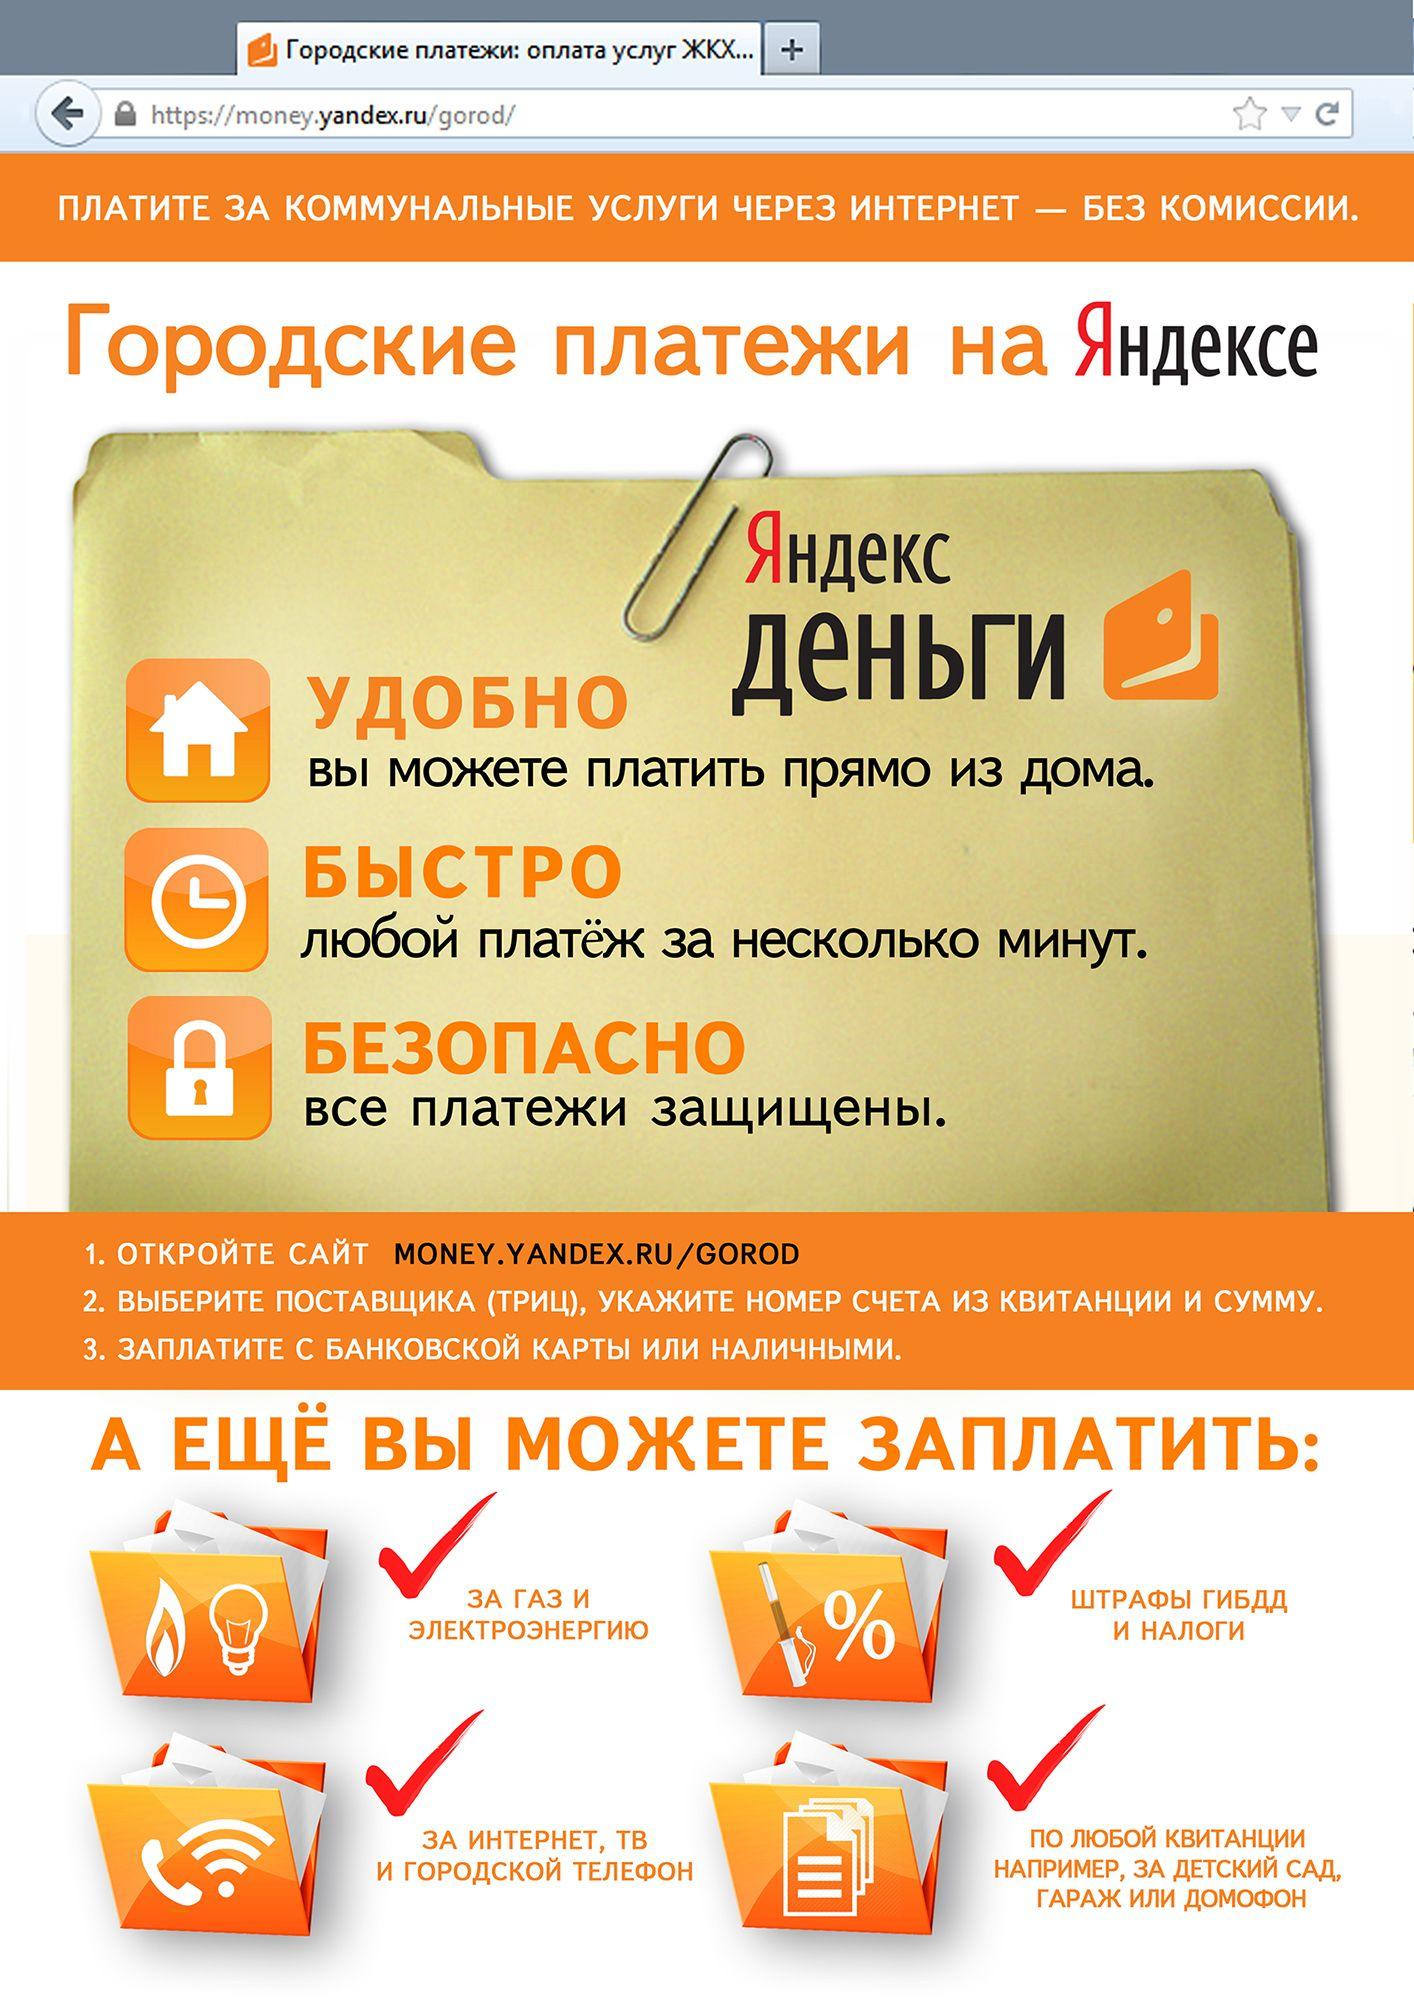 Реклама Яндекс.Денег для оплаты ЖКХ - дизайнер happyendless